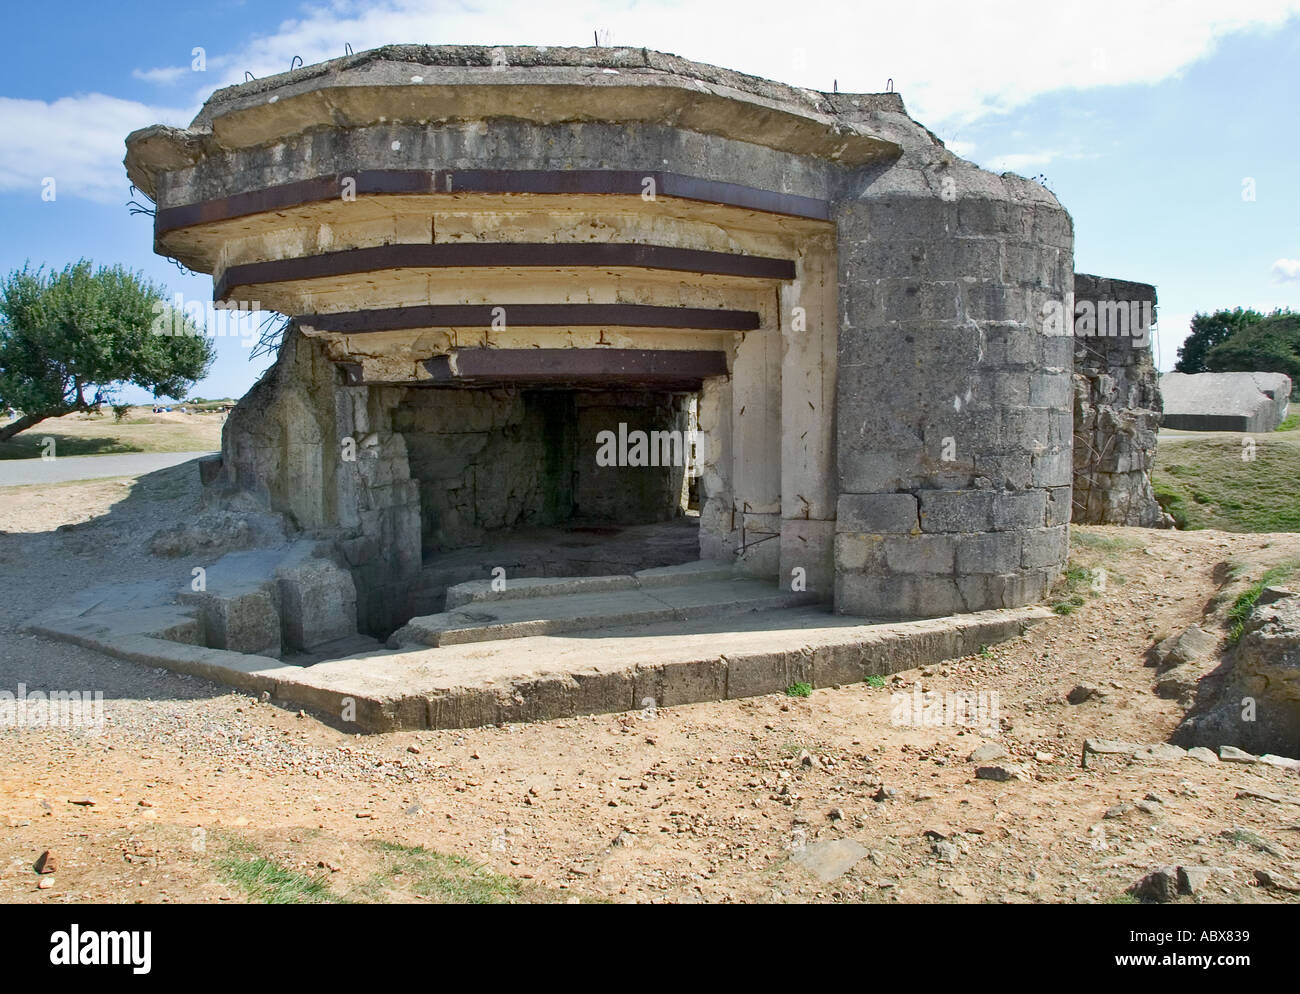 World War 2 bunker - German artillery gun emplacement bunker at Pointe Du Hoc, Normandy, France - Stock Image